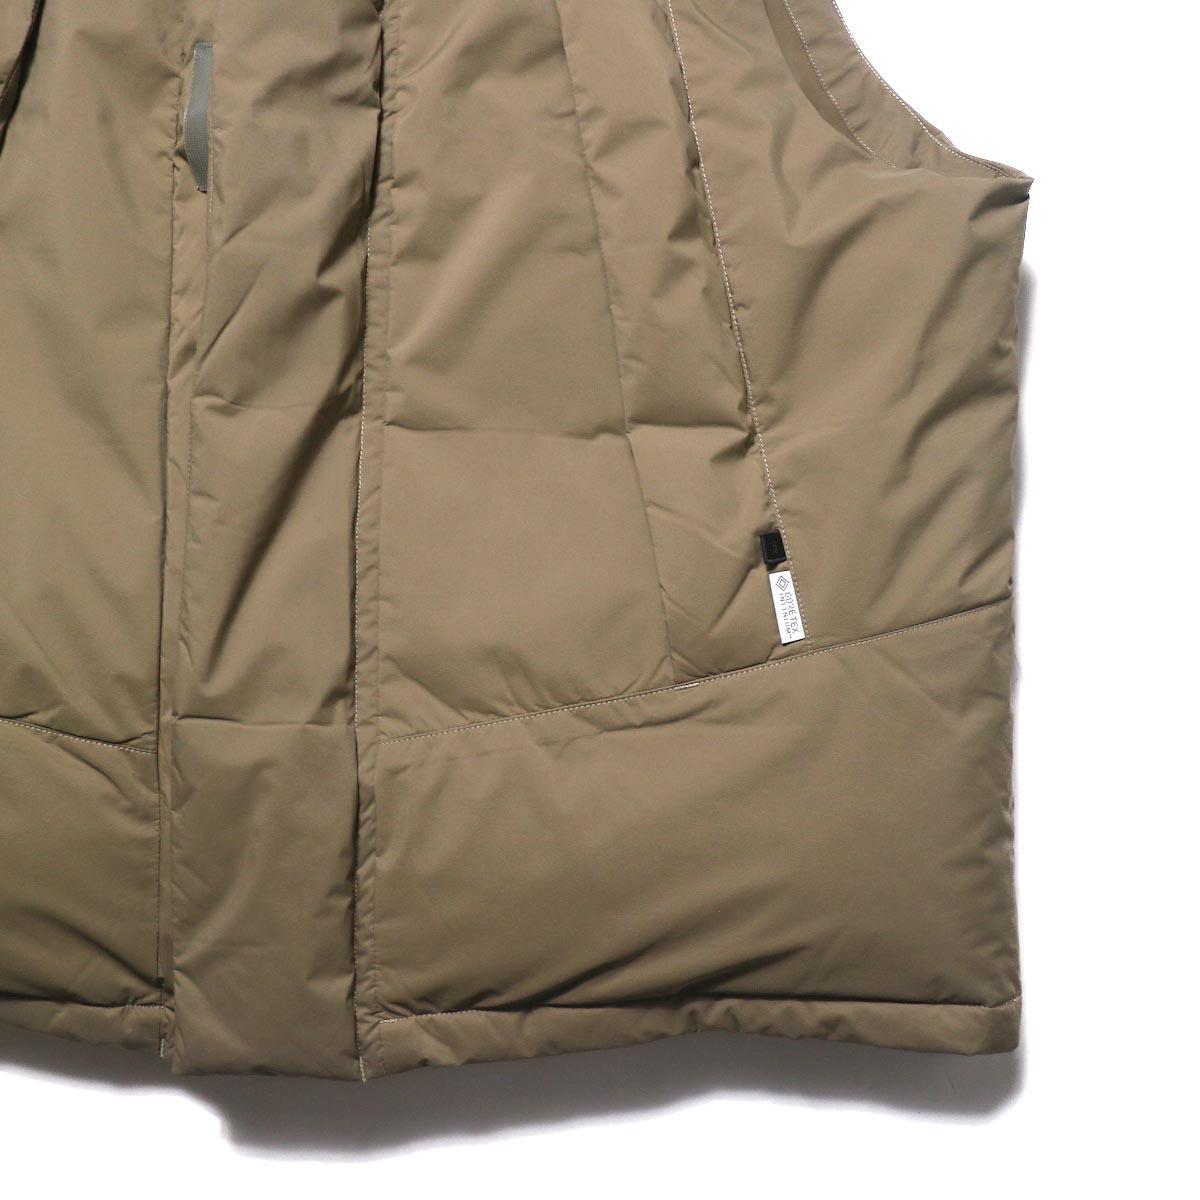 DAIWA PIER39 / GORE-TEX INFINIUM FIELD DOWN VEST (Grege)裾、ポケット